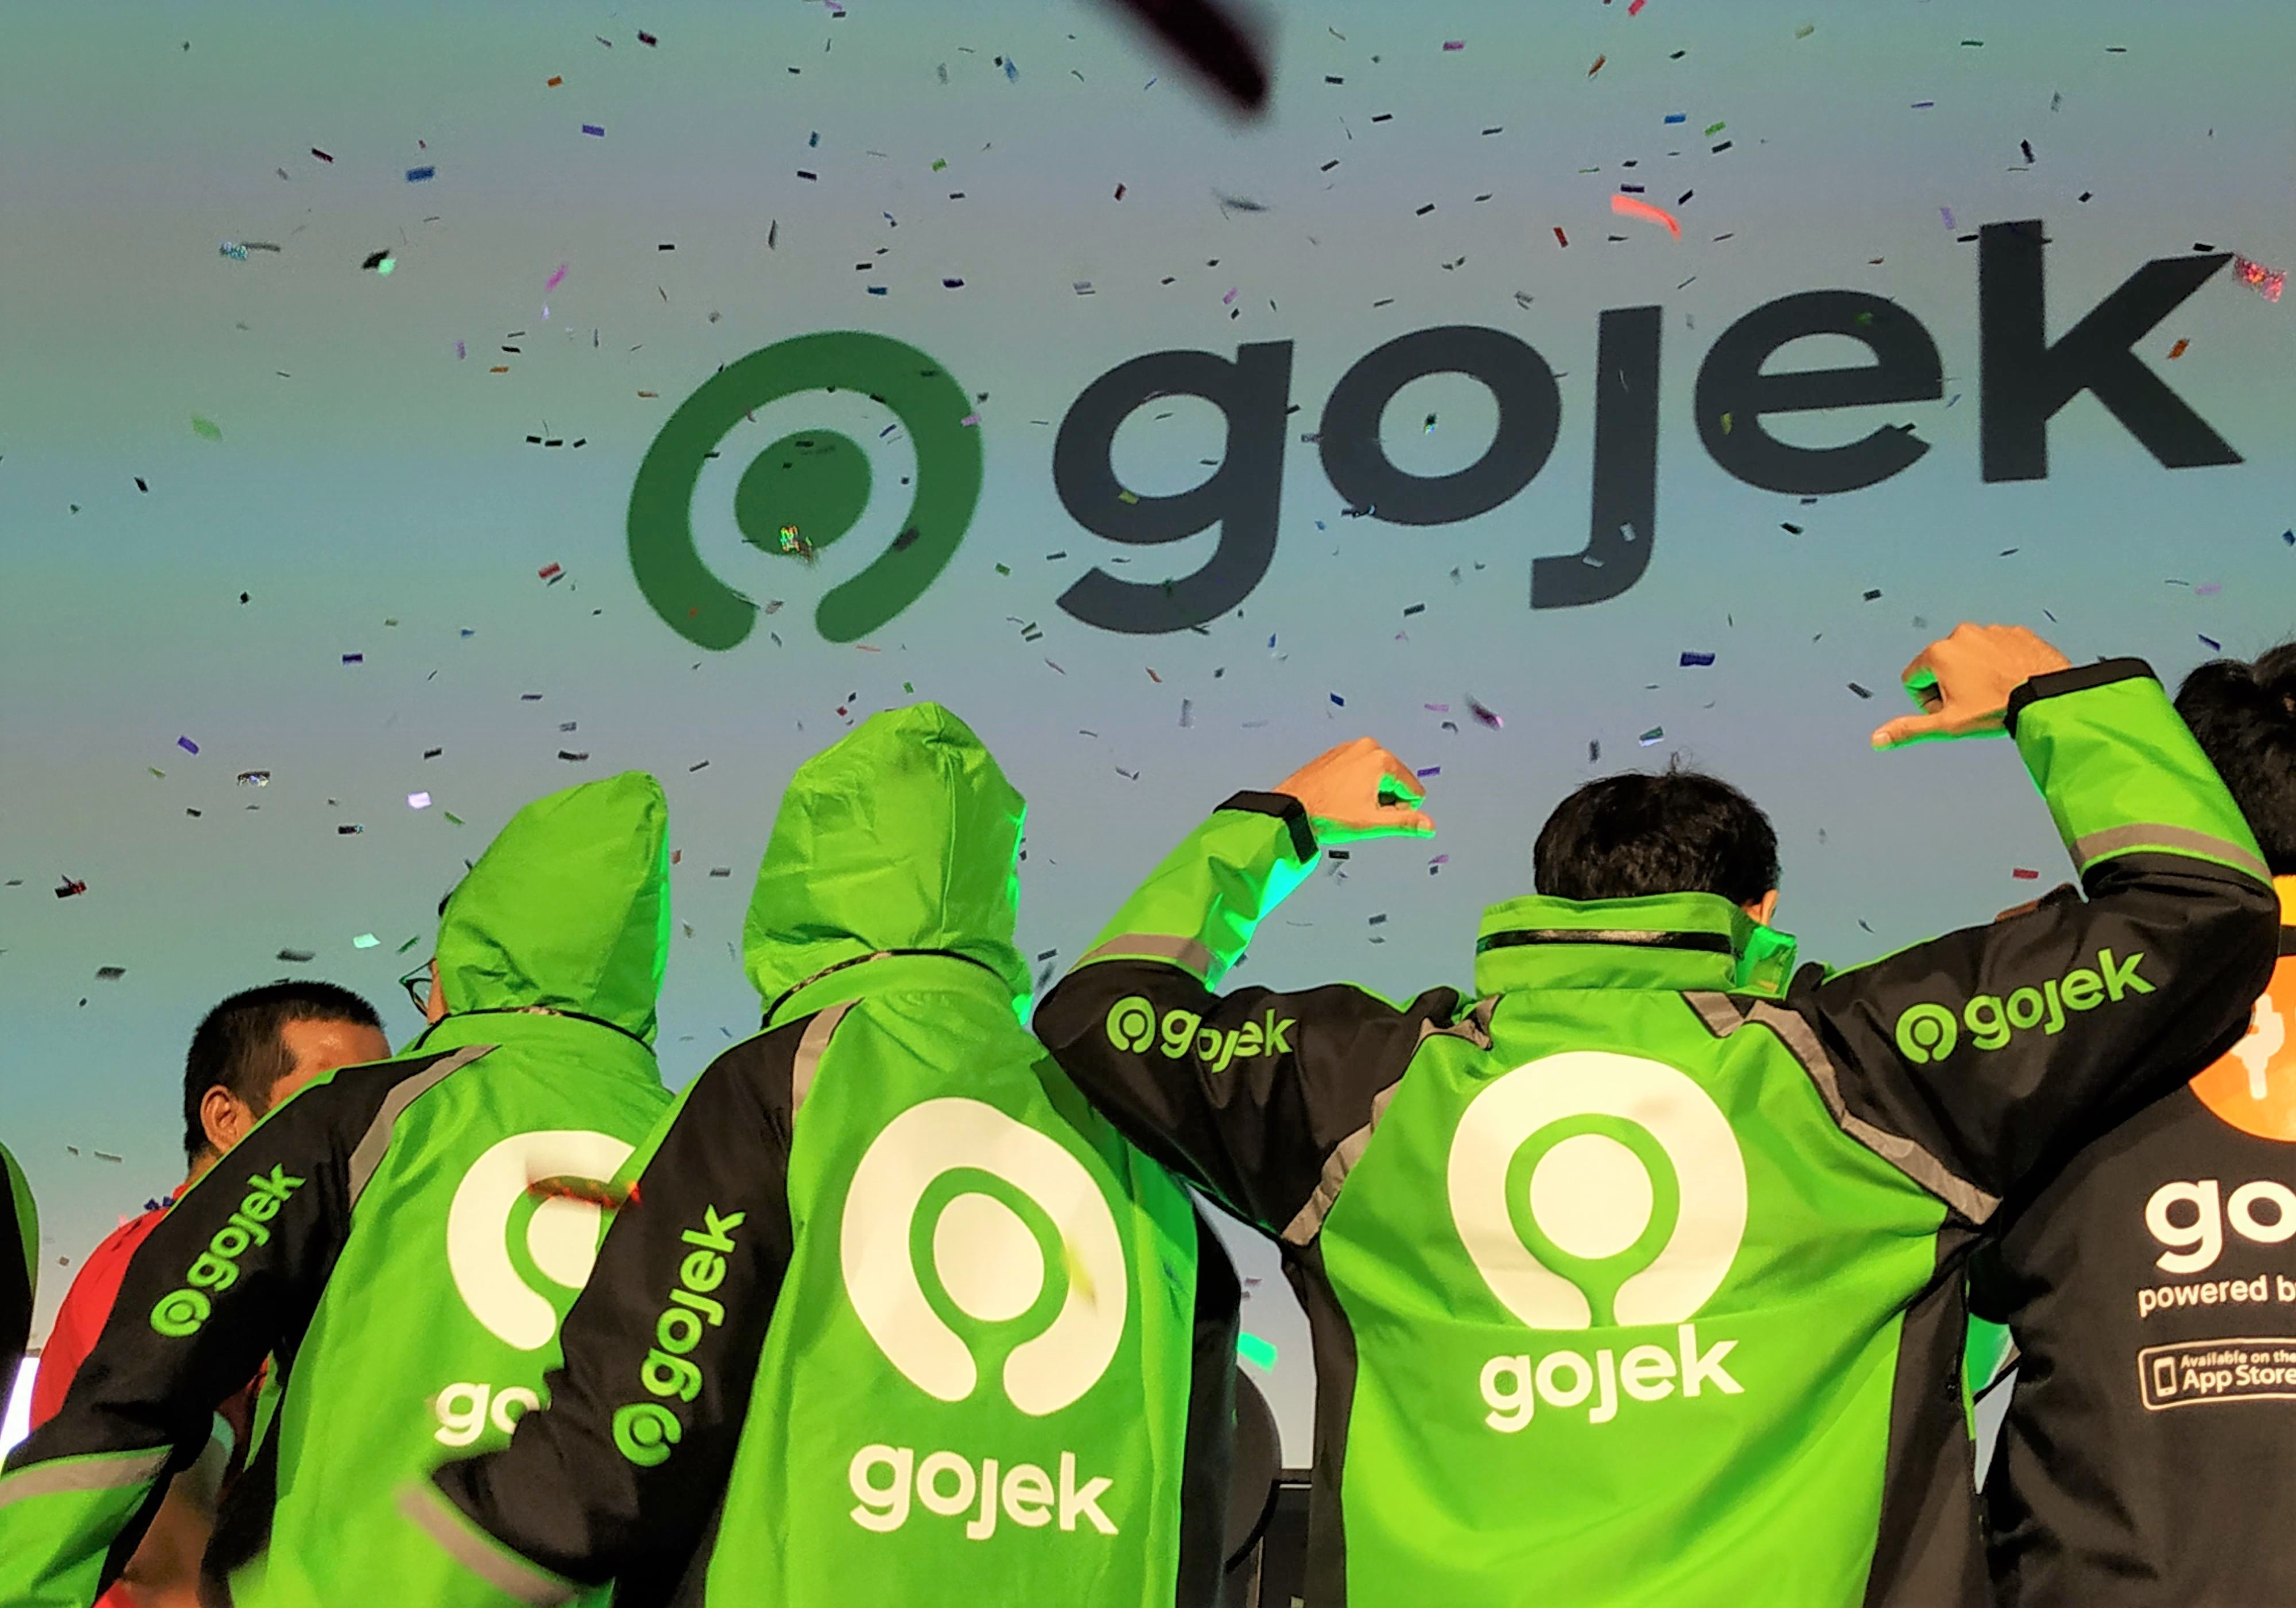 Gojek Startups co-CEO